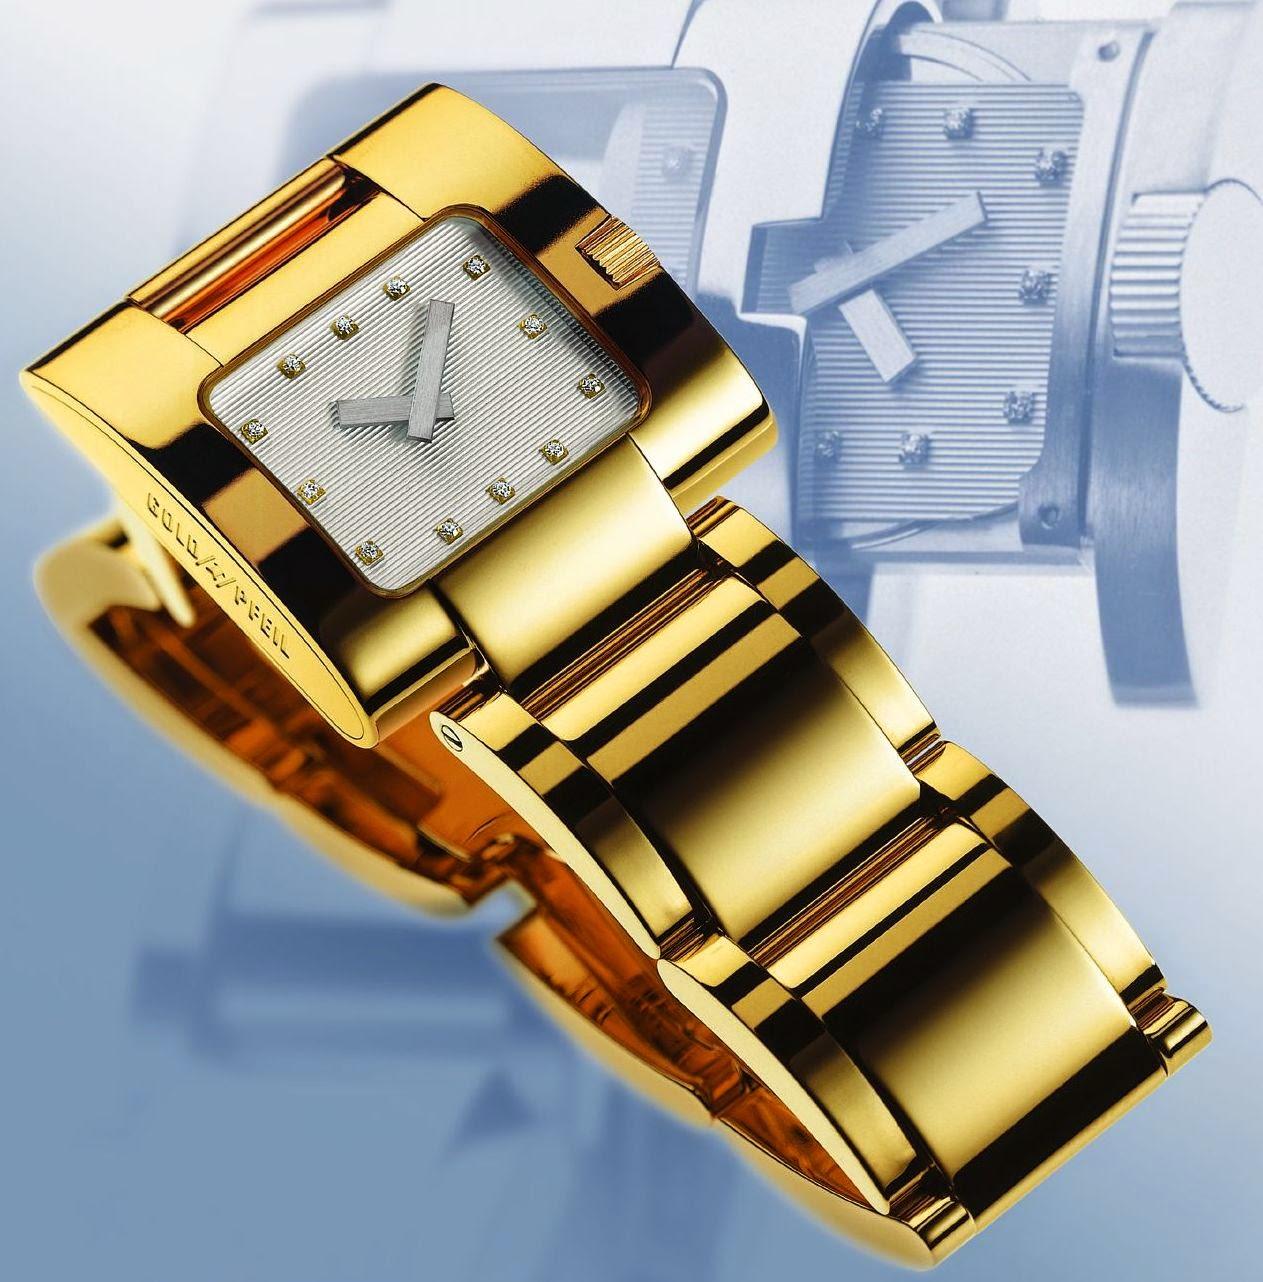 GOLDPFEIL GENEVE - Tiroir Watch by Thomas Baumgartner